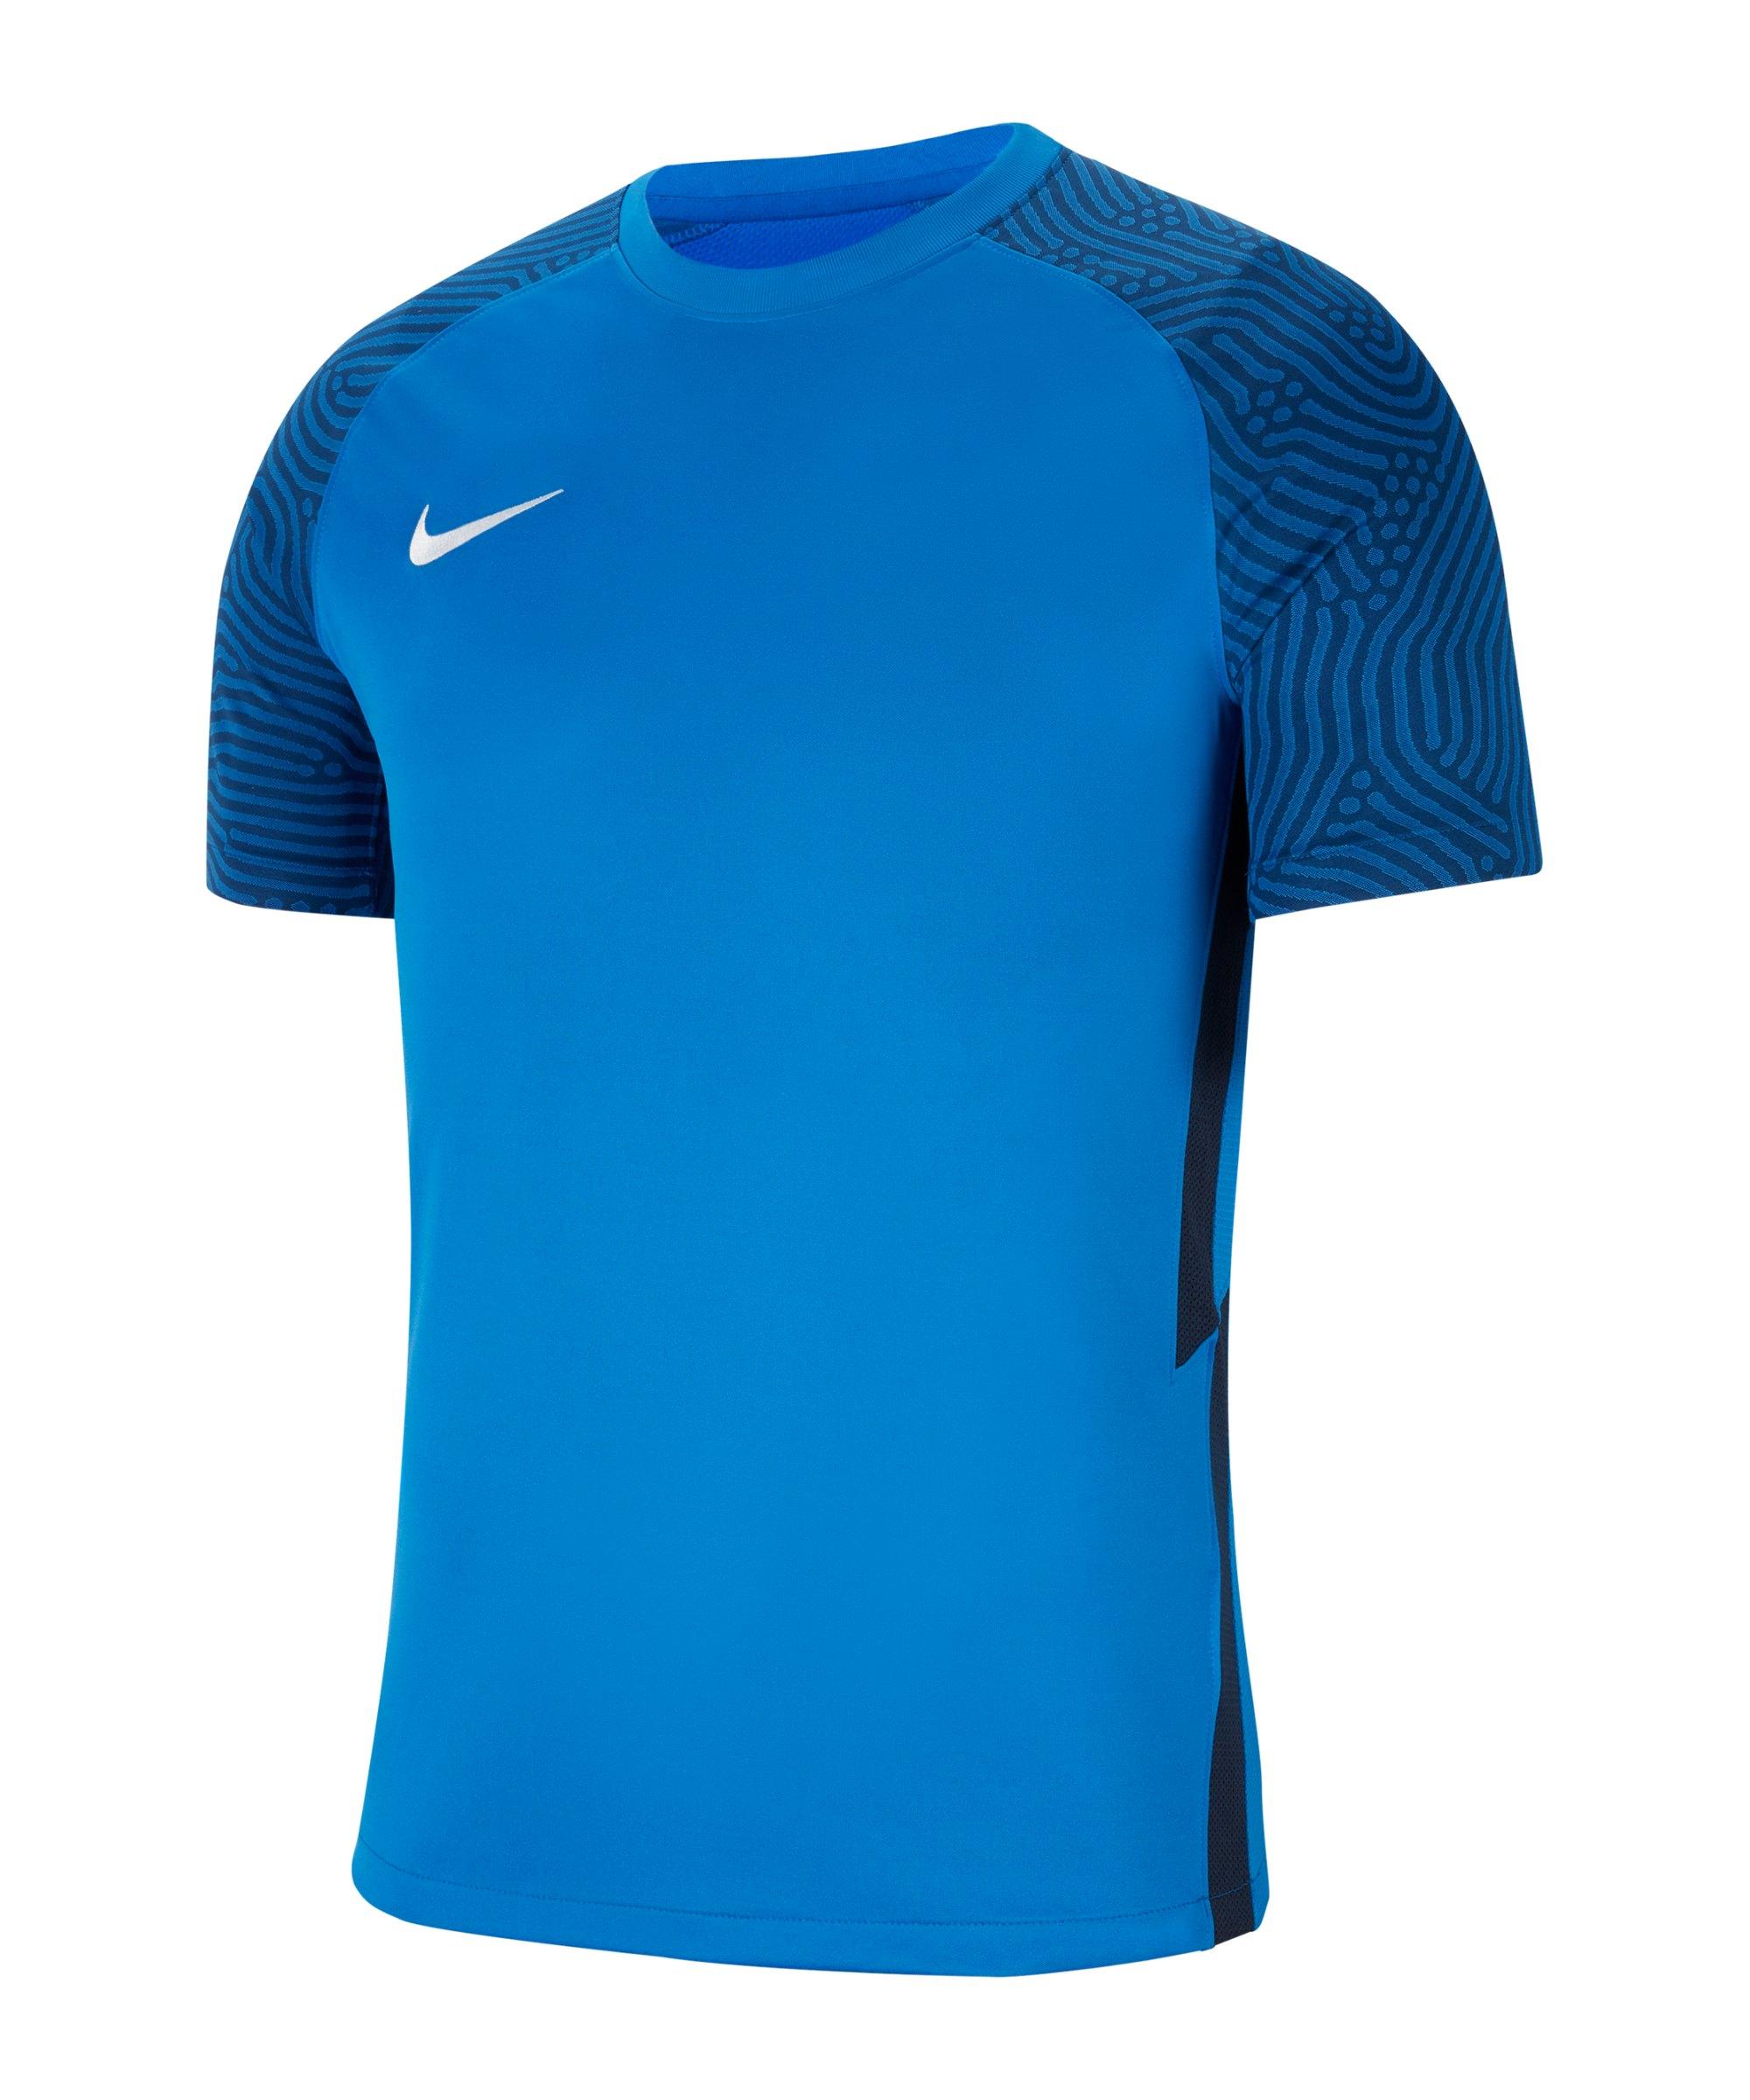 Nike Strike II Trikot kurzarm Blau Weiss F463 - blau